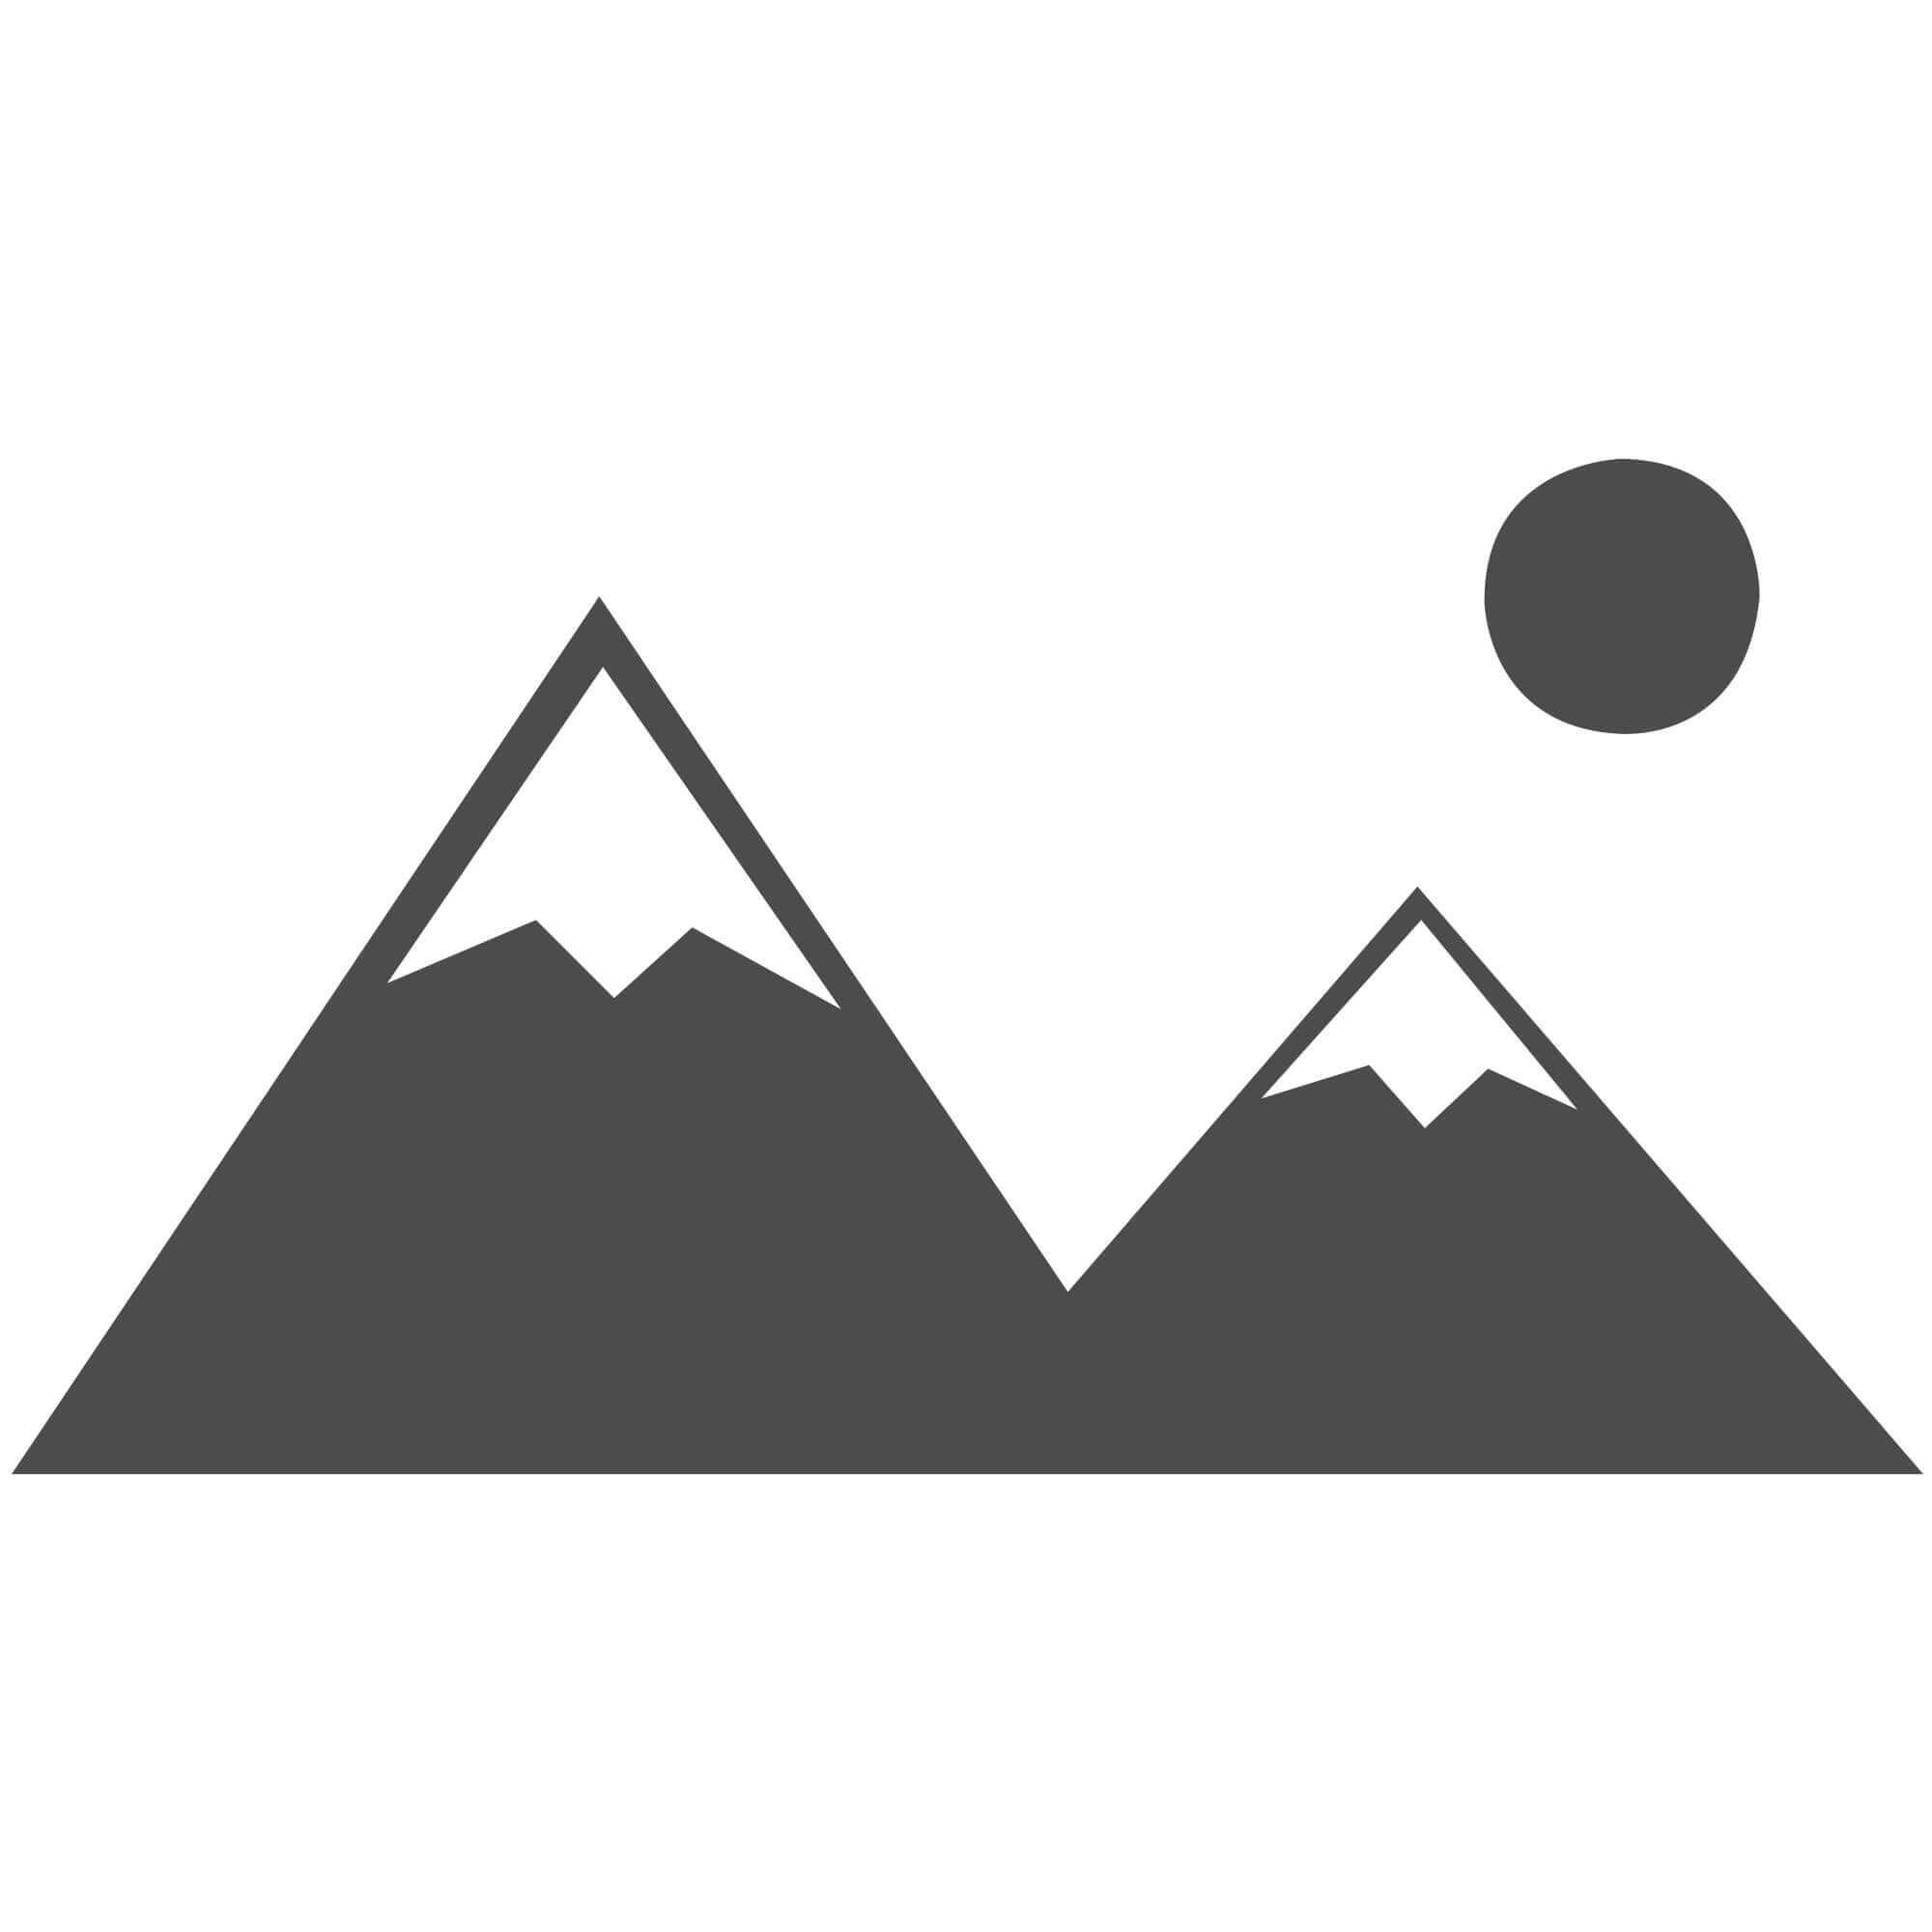 "Brighton Indoor Outdoor Rug - 0122-5000-120 x 170 cm (4' x 5'7"")"